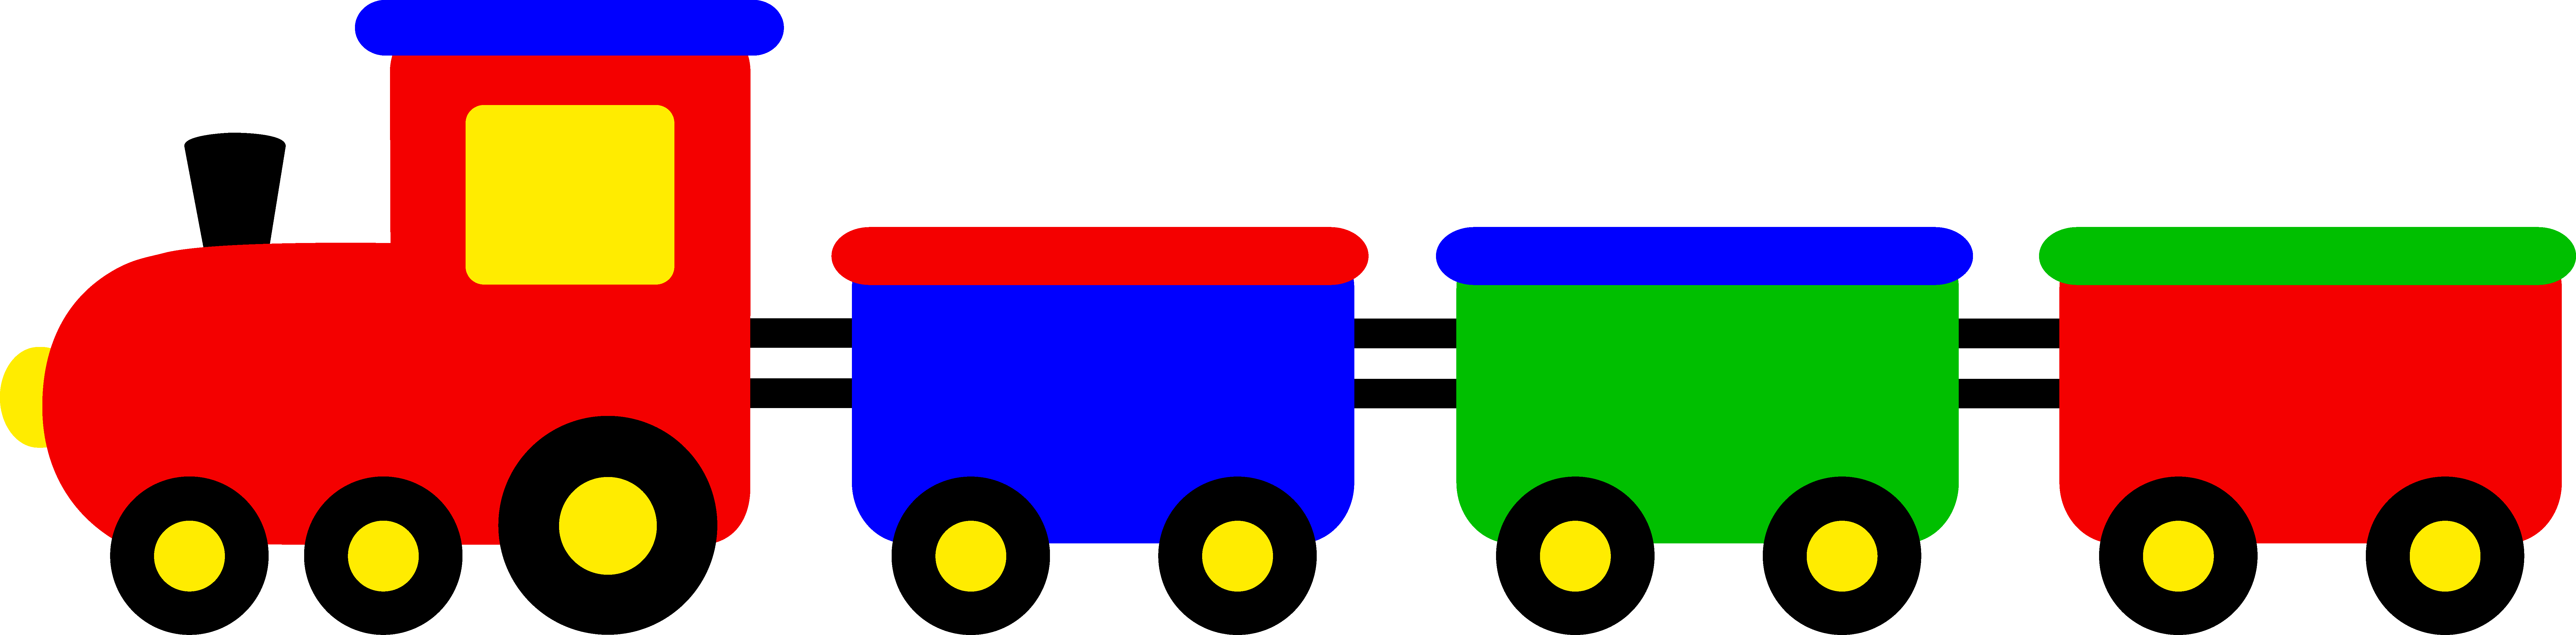 9782x2412 Simple Train Clip Art